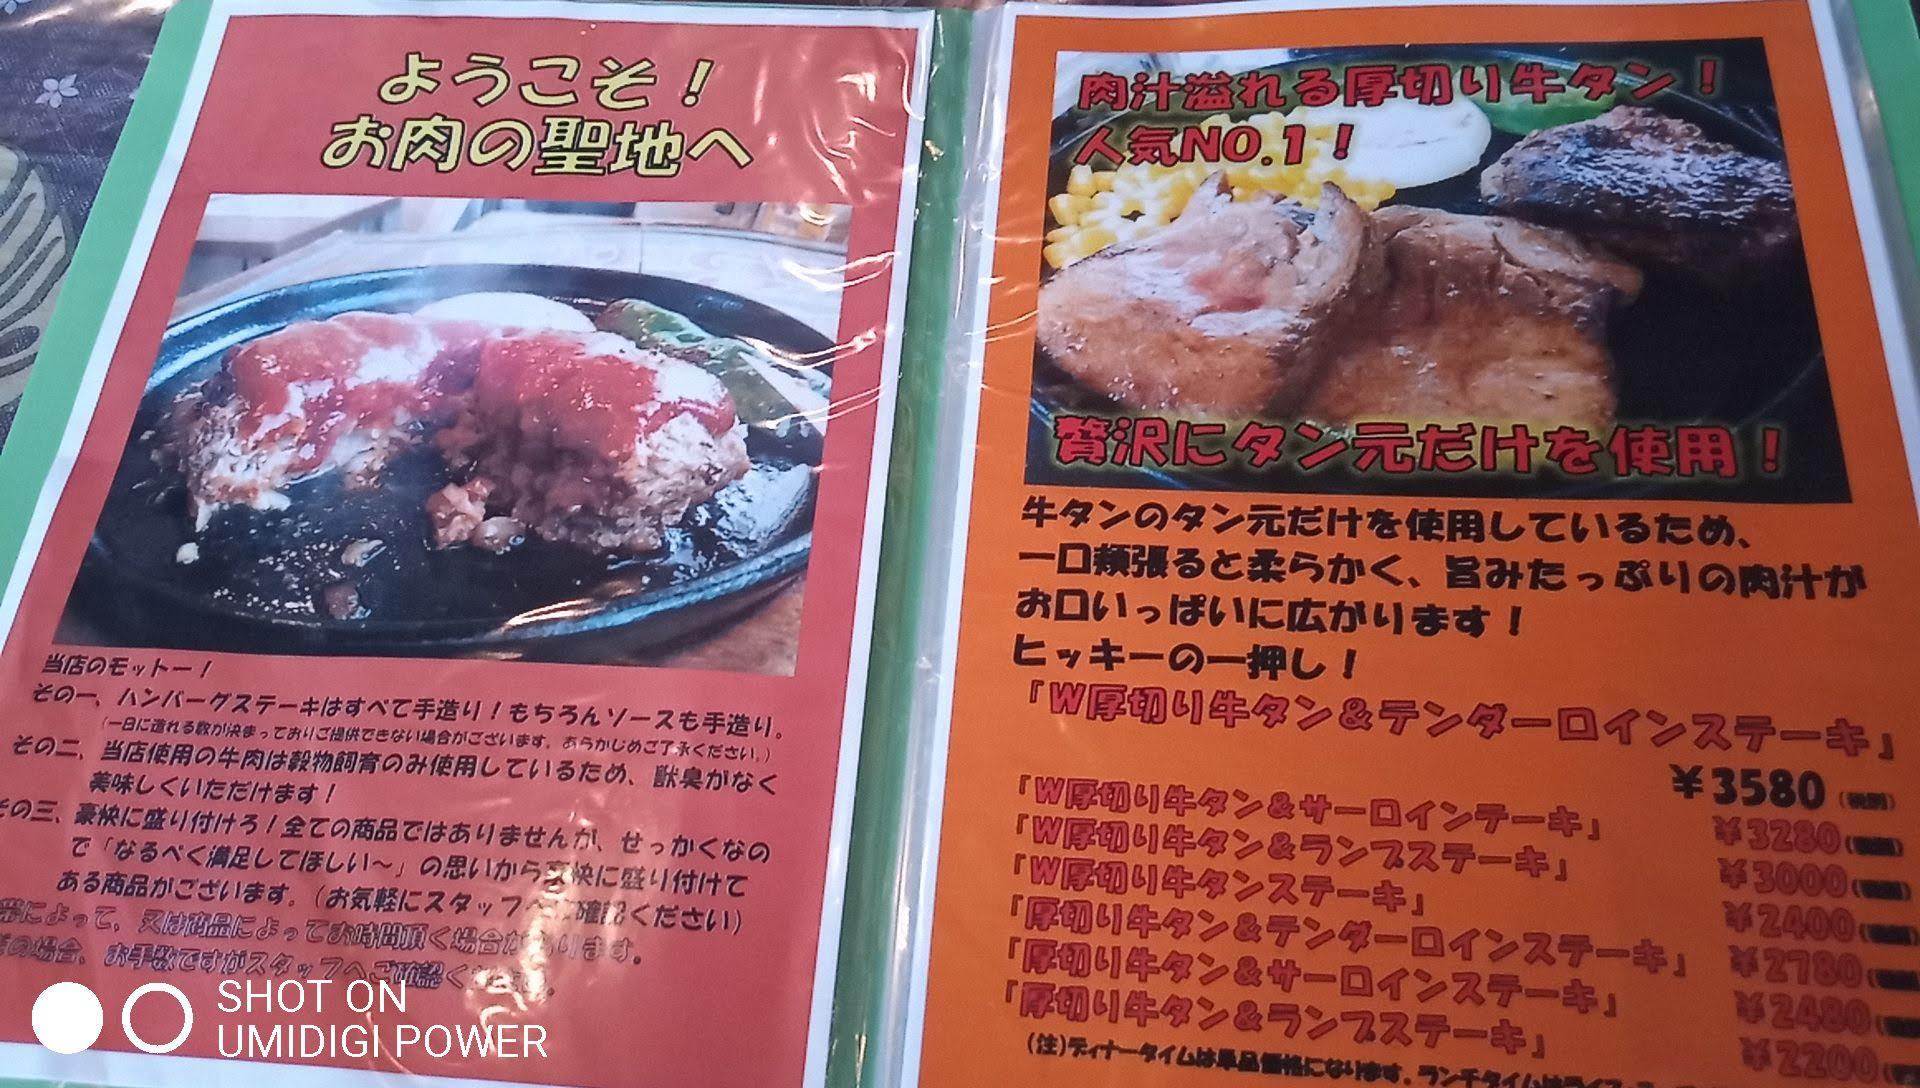 the menu of Meat Bar Hikiy's 0